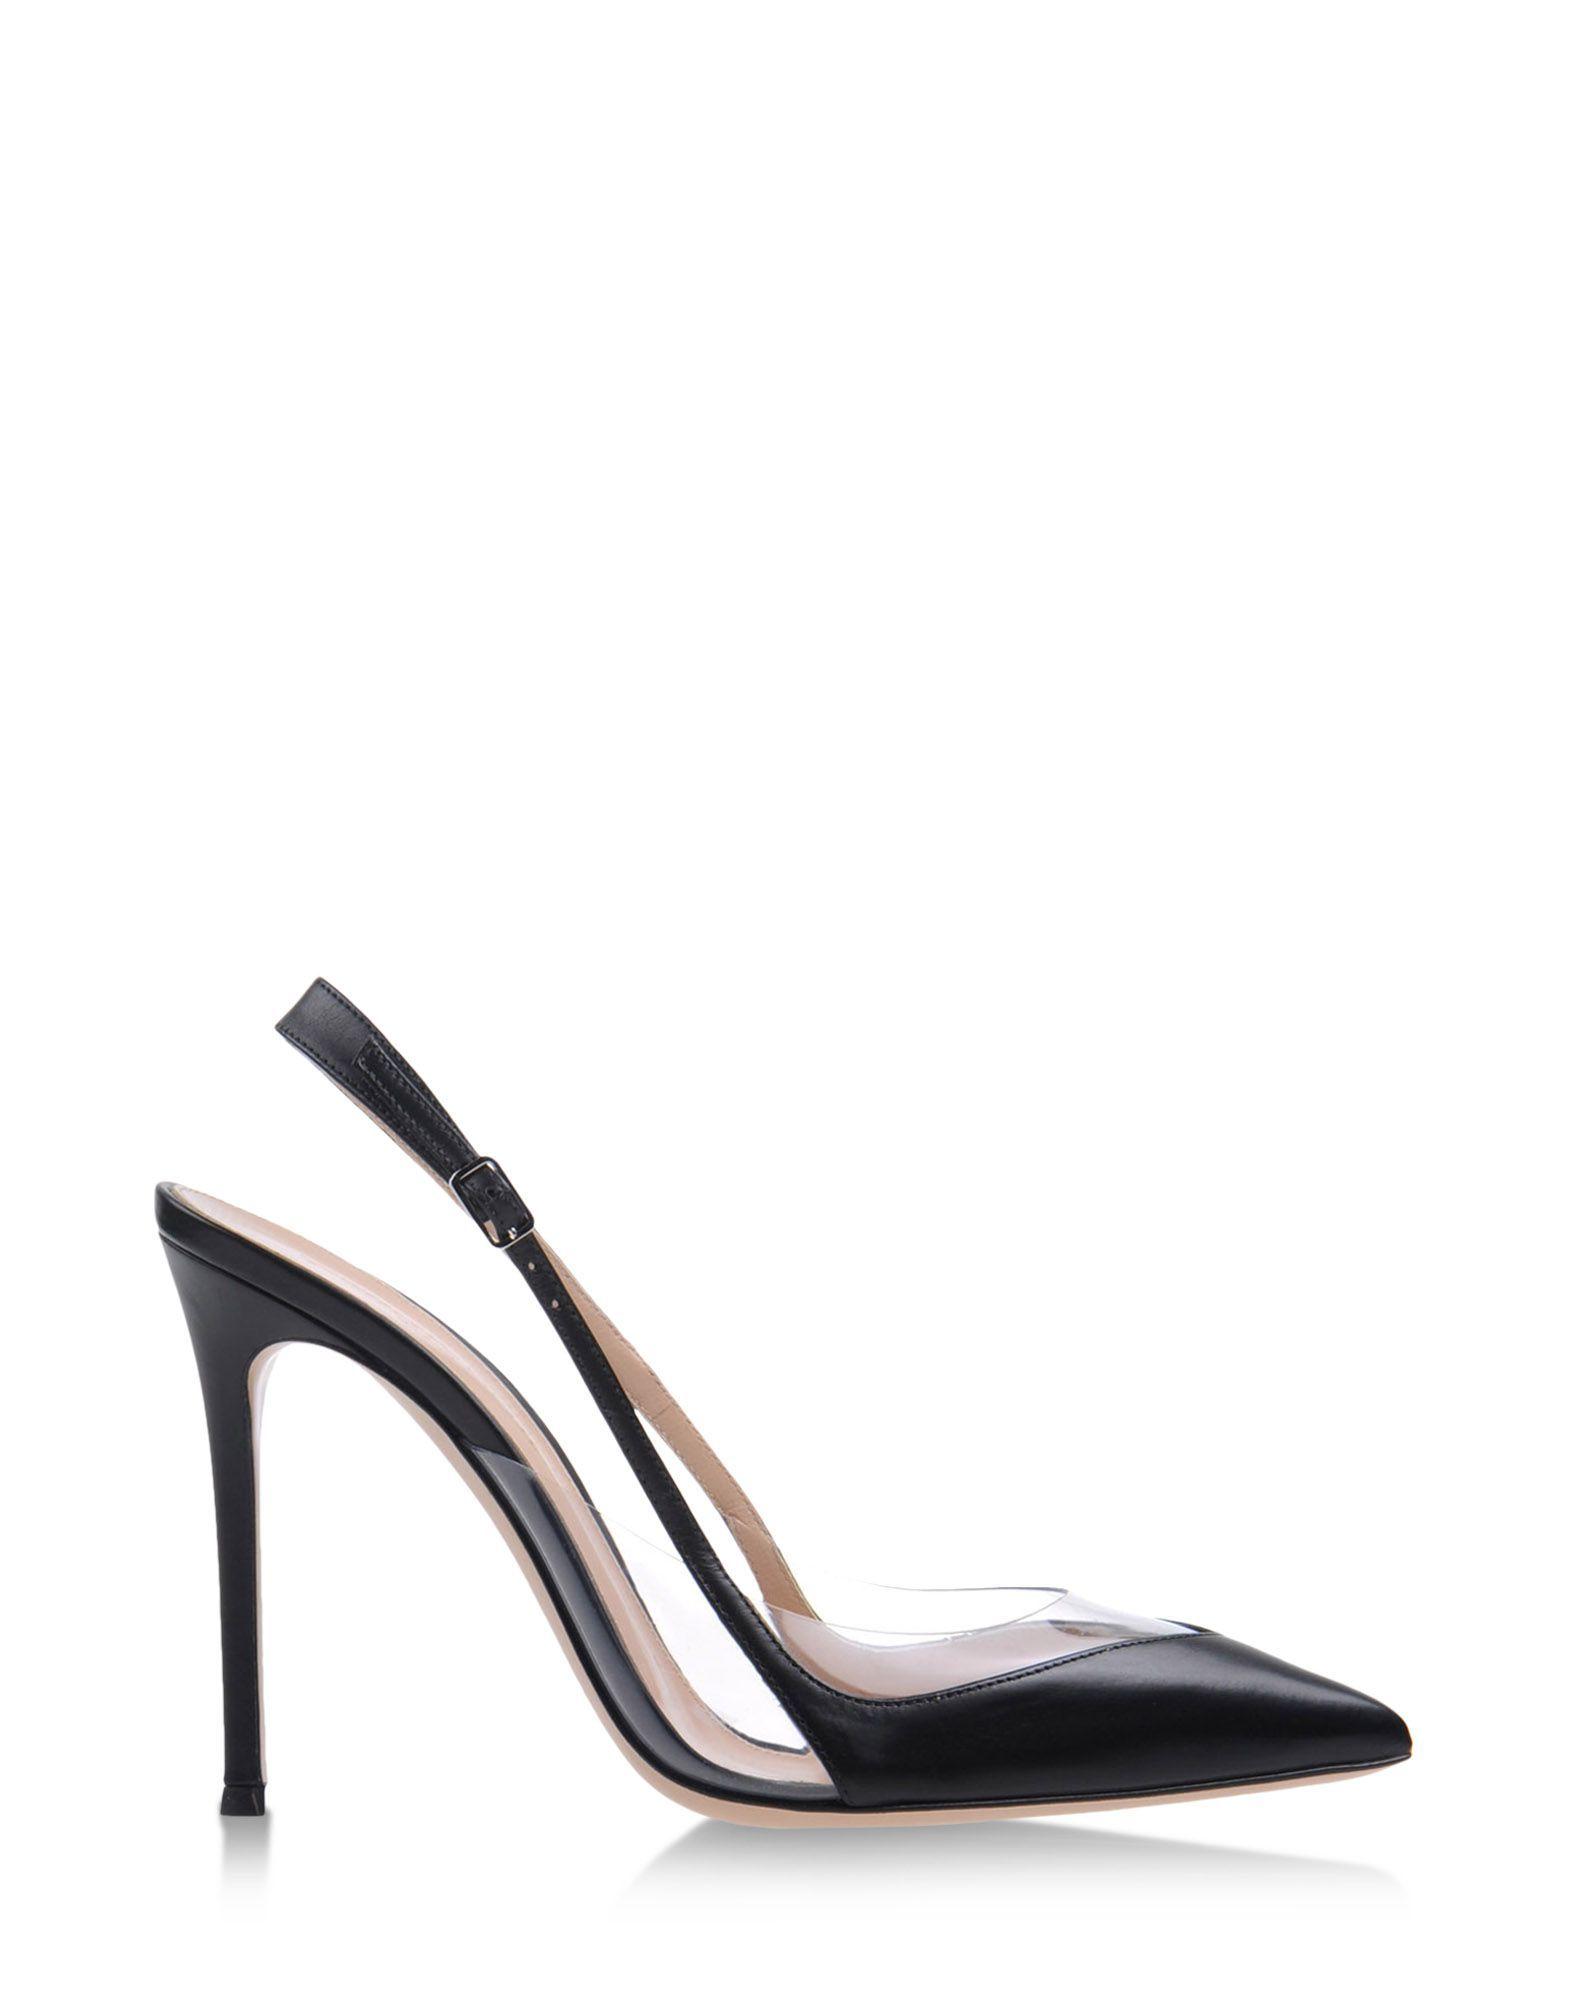 4ce2b7959db Gianvito Rossi Leather   PVC Slingbacks - Pointed Toe Heels